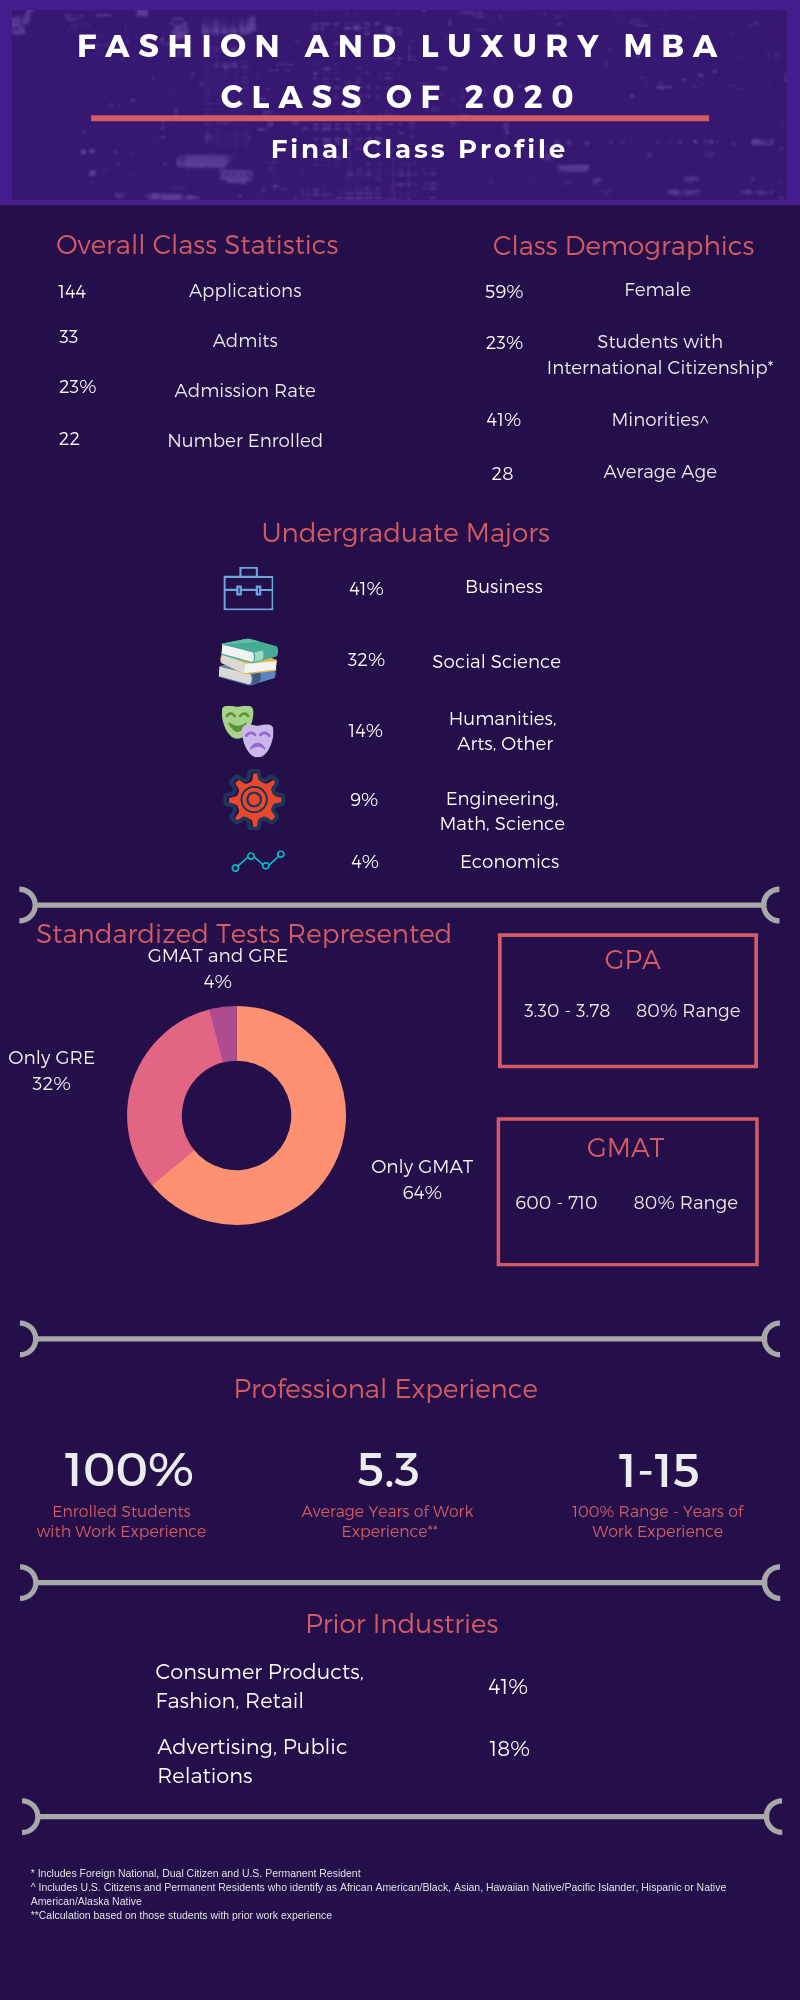 Fashion & Luxury MBA Class of 2020 Profile